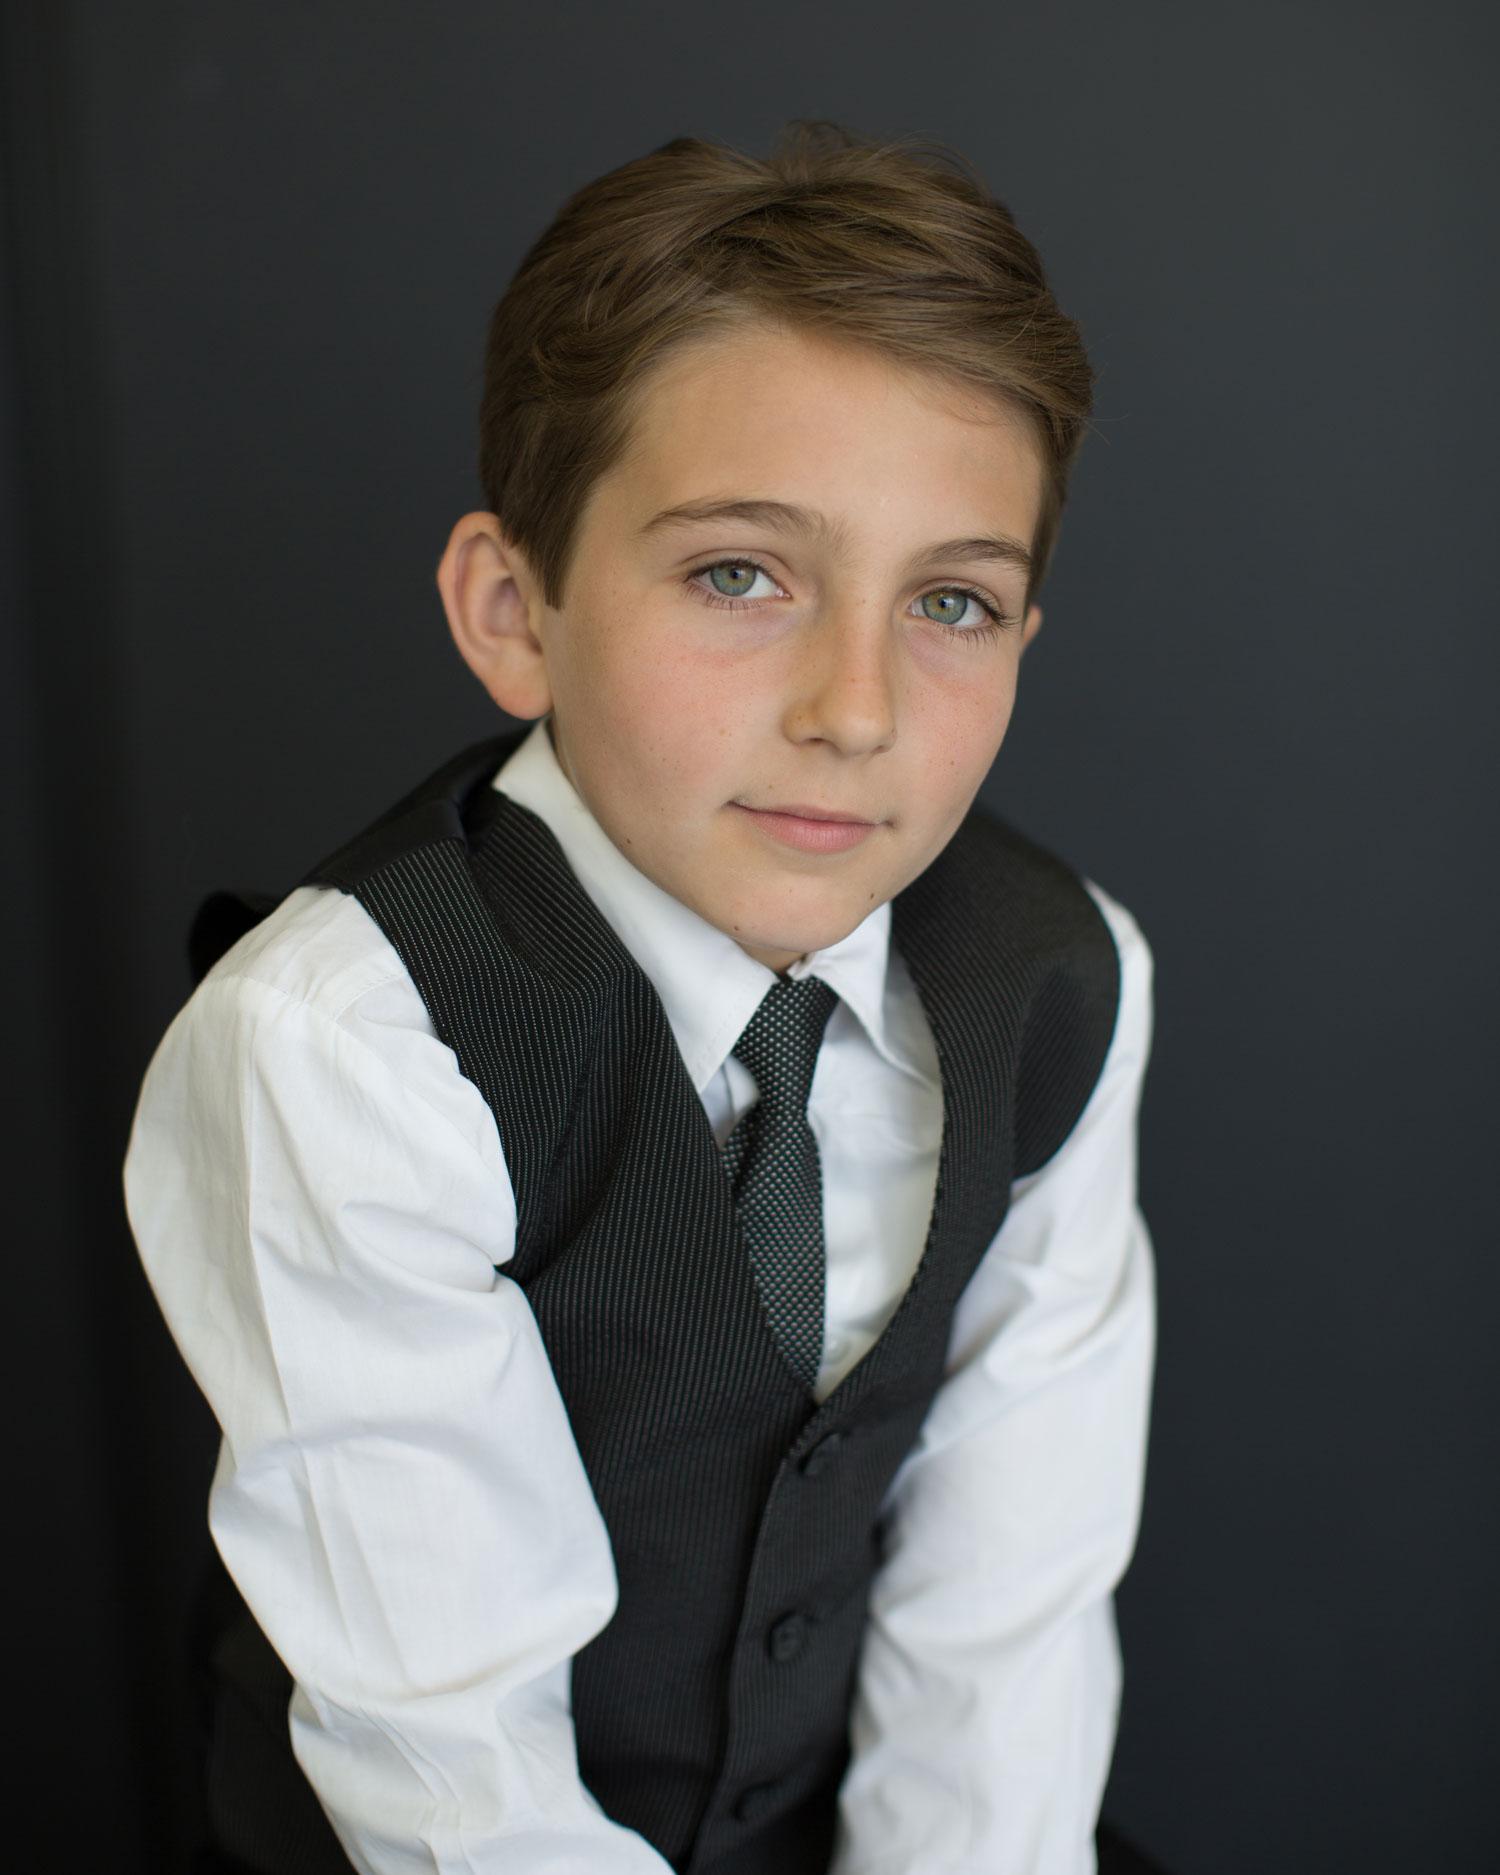 Alessandro-Concas-Young-Entrepreneur (2)